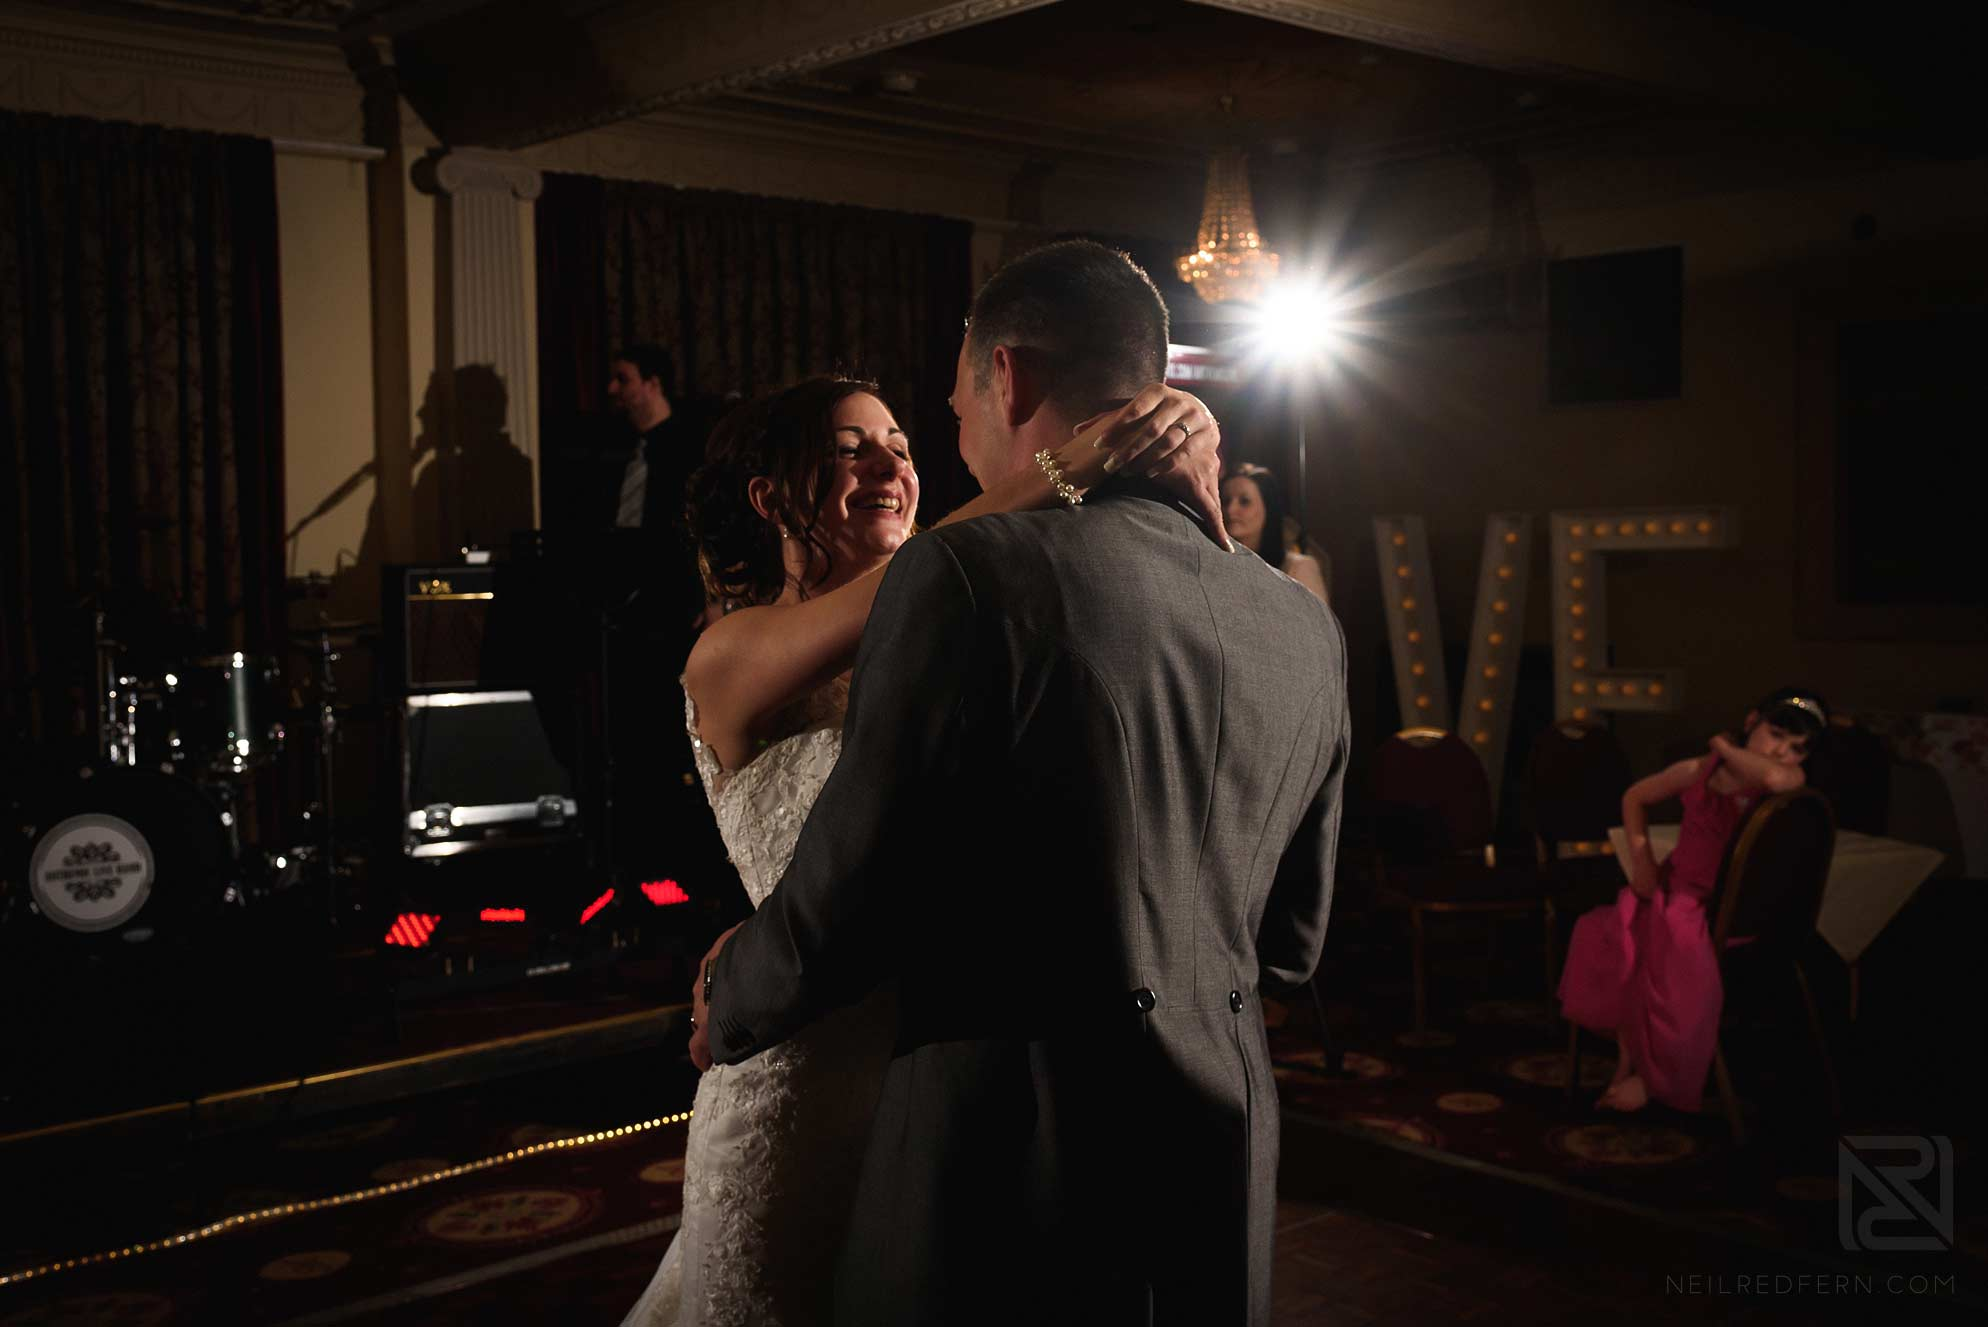 Metropole-Hotel-Llandrindod-Wells-wedding-32